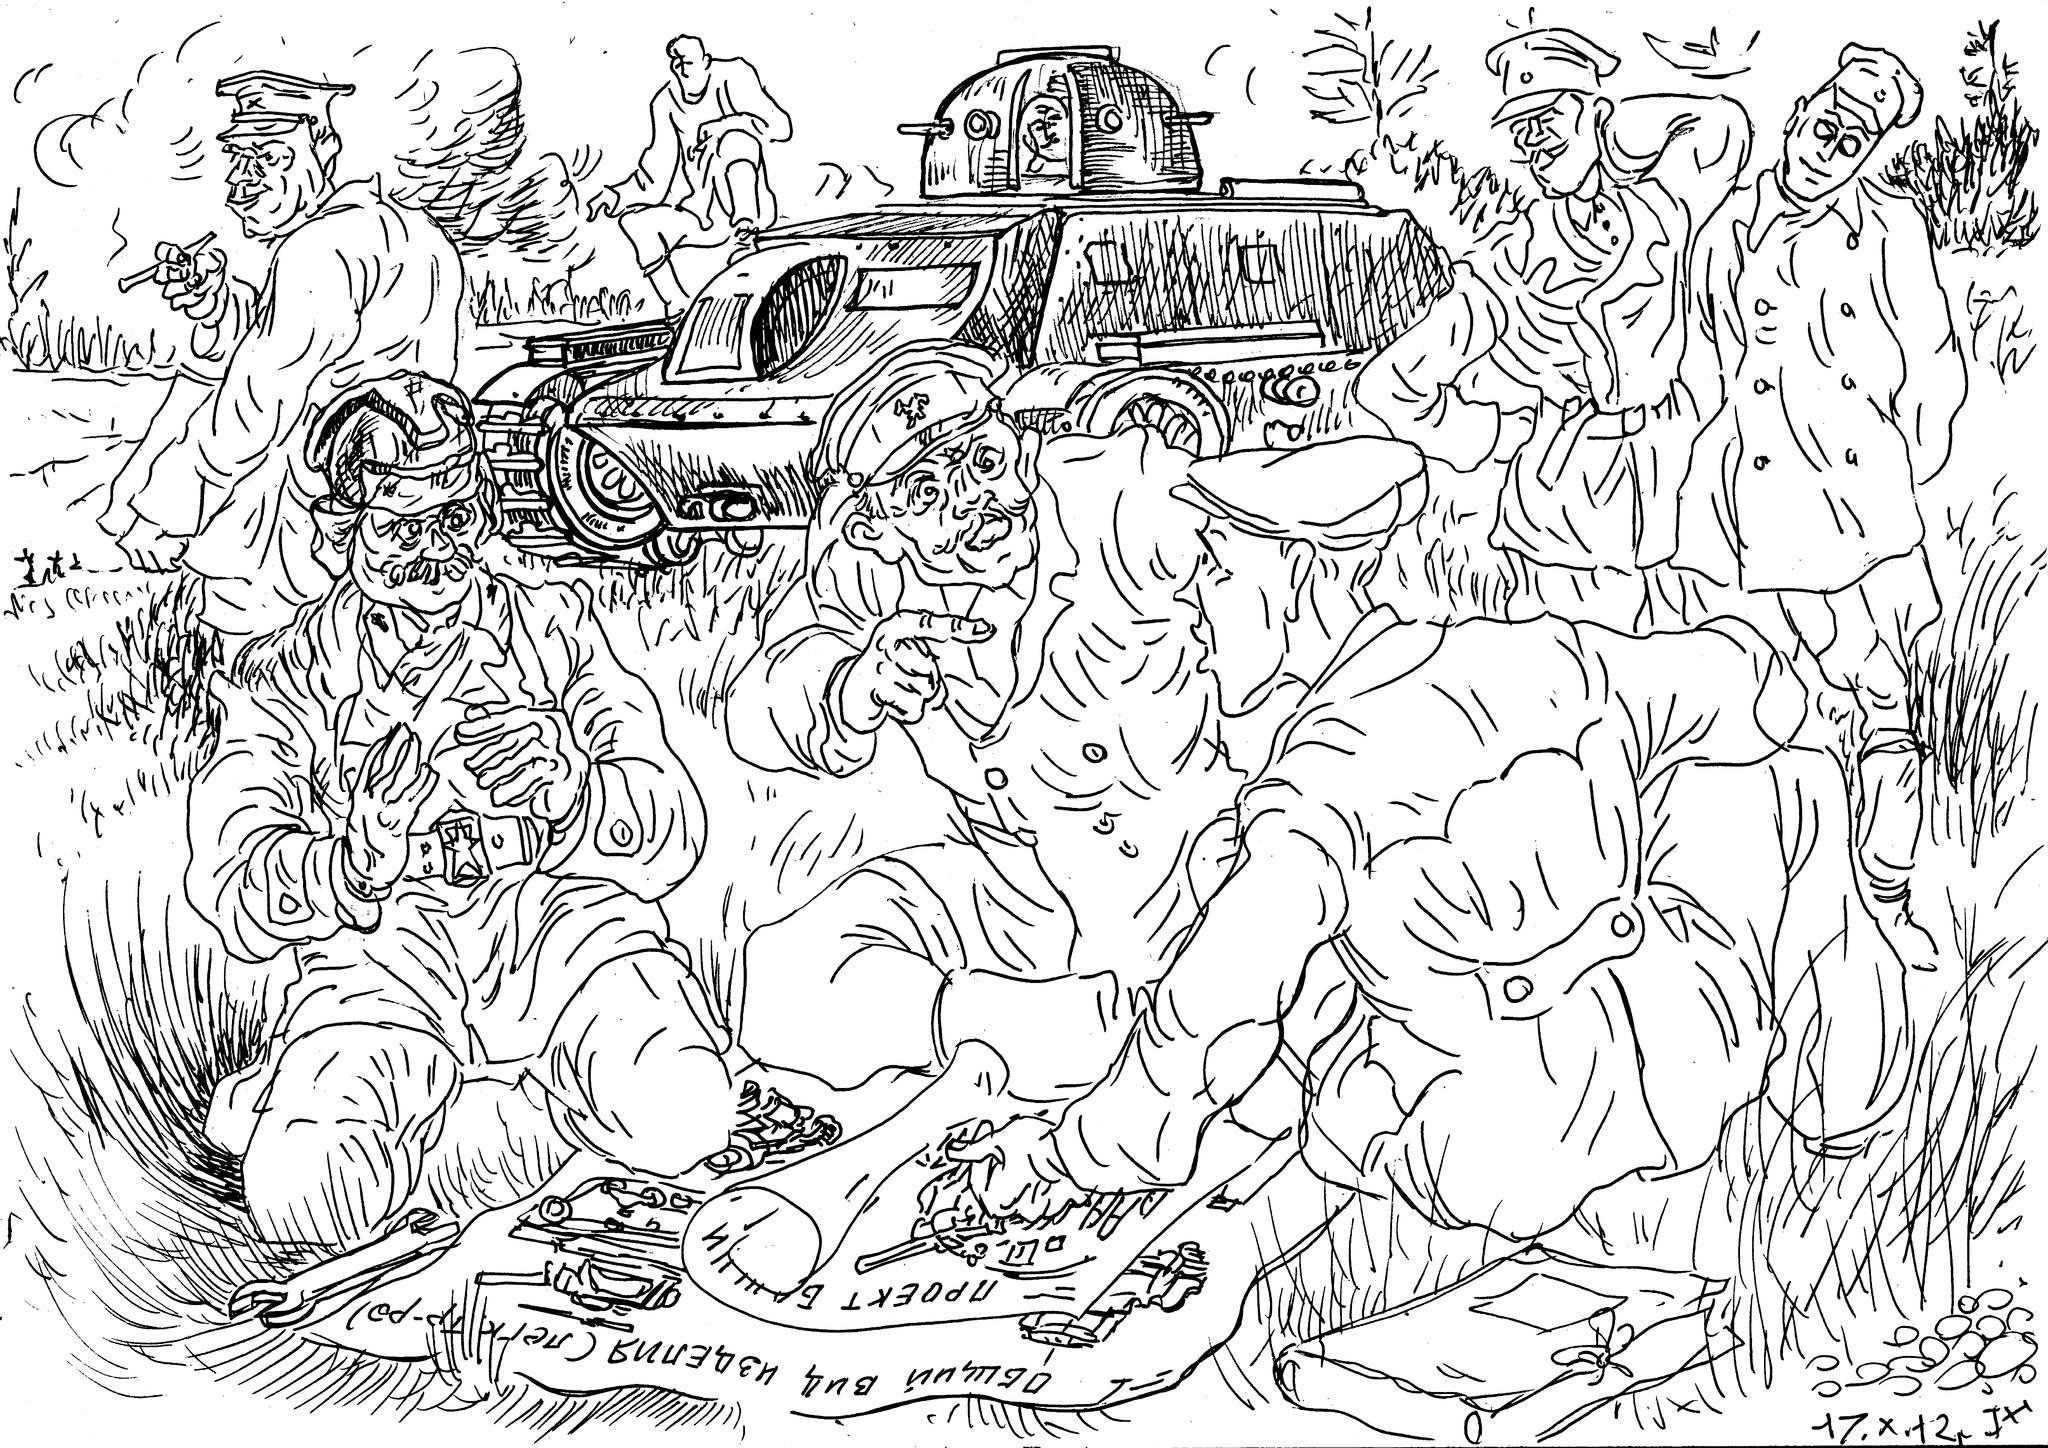 До 15 сентября 1933 года существовала под Казанью танковая школа «Кама»